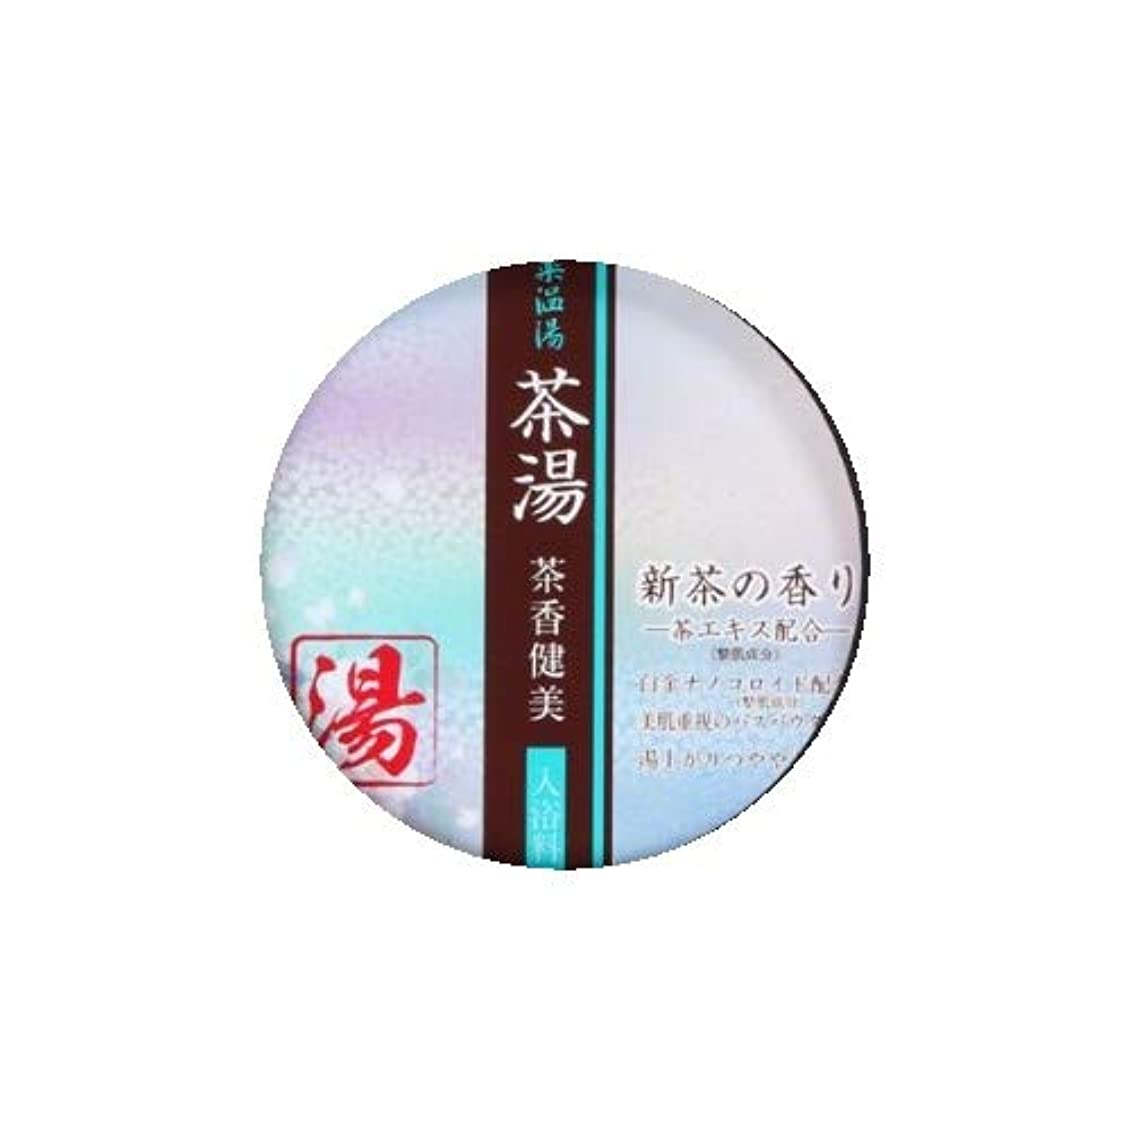 喉頭重要対話薬温湯 茶湯 入浴料 新茶の香り POF-10S